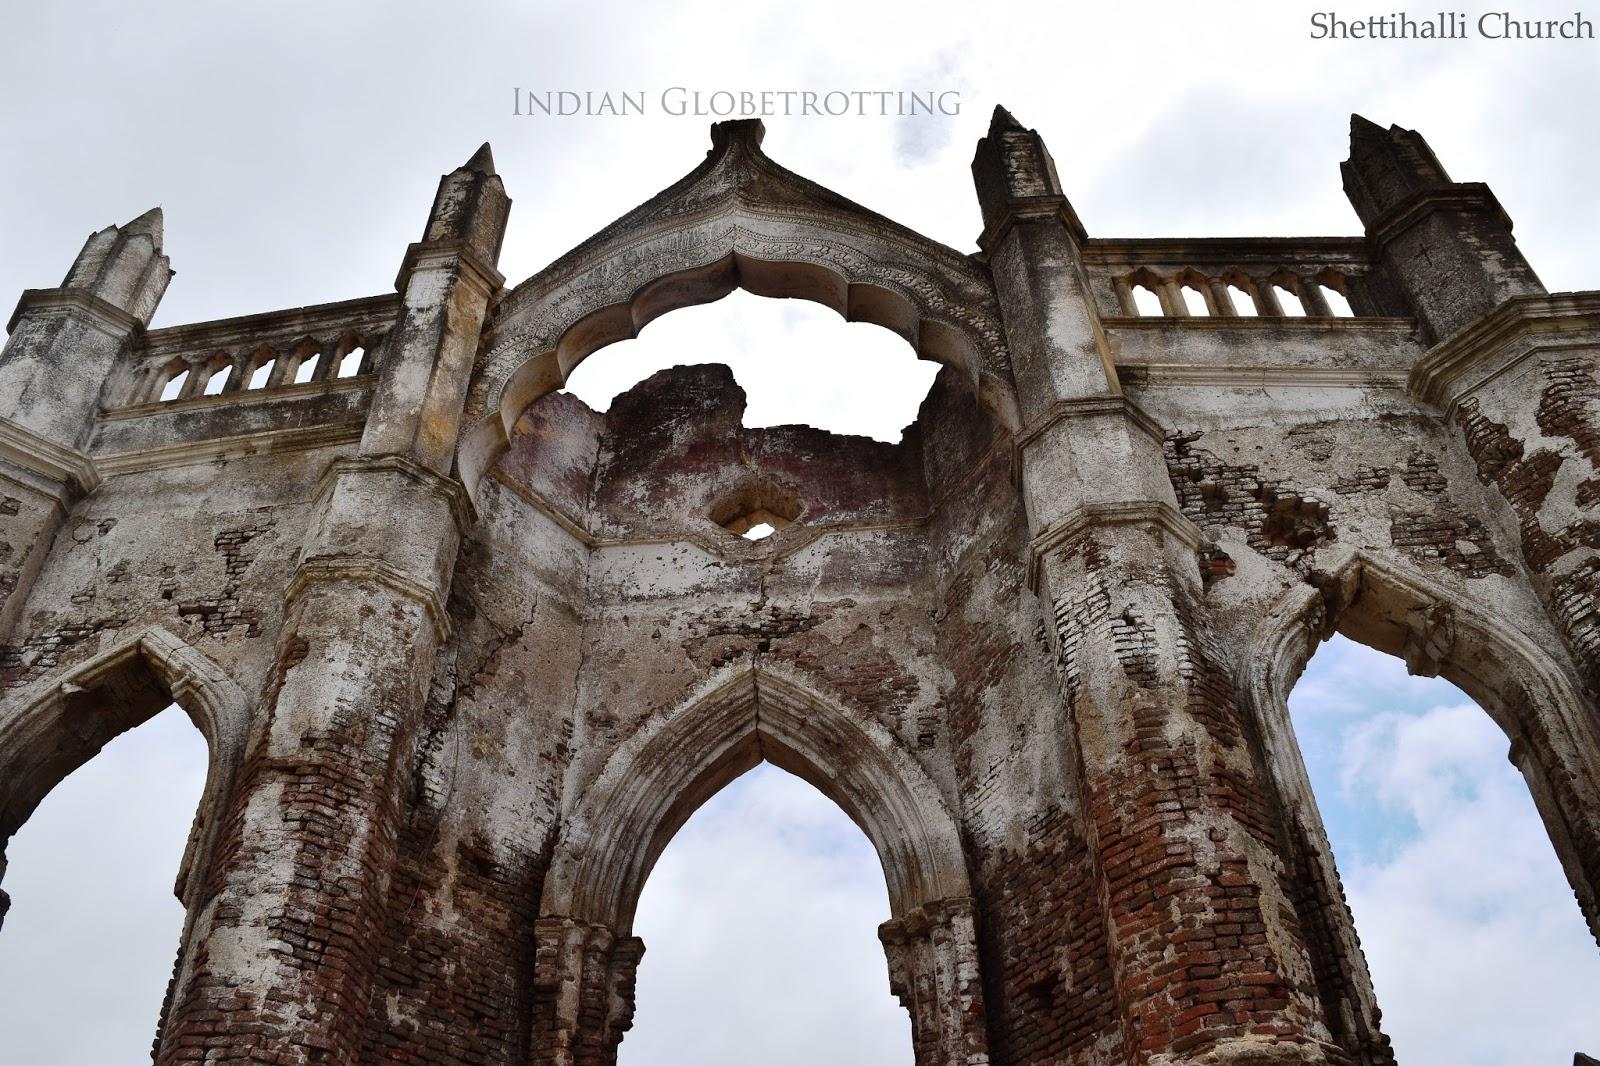 Arches of Shettihalli Church built in Gothic Style, Karnataka